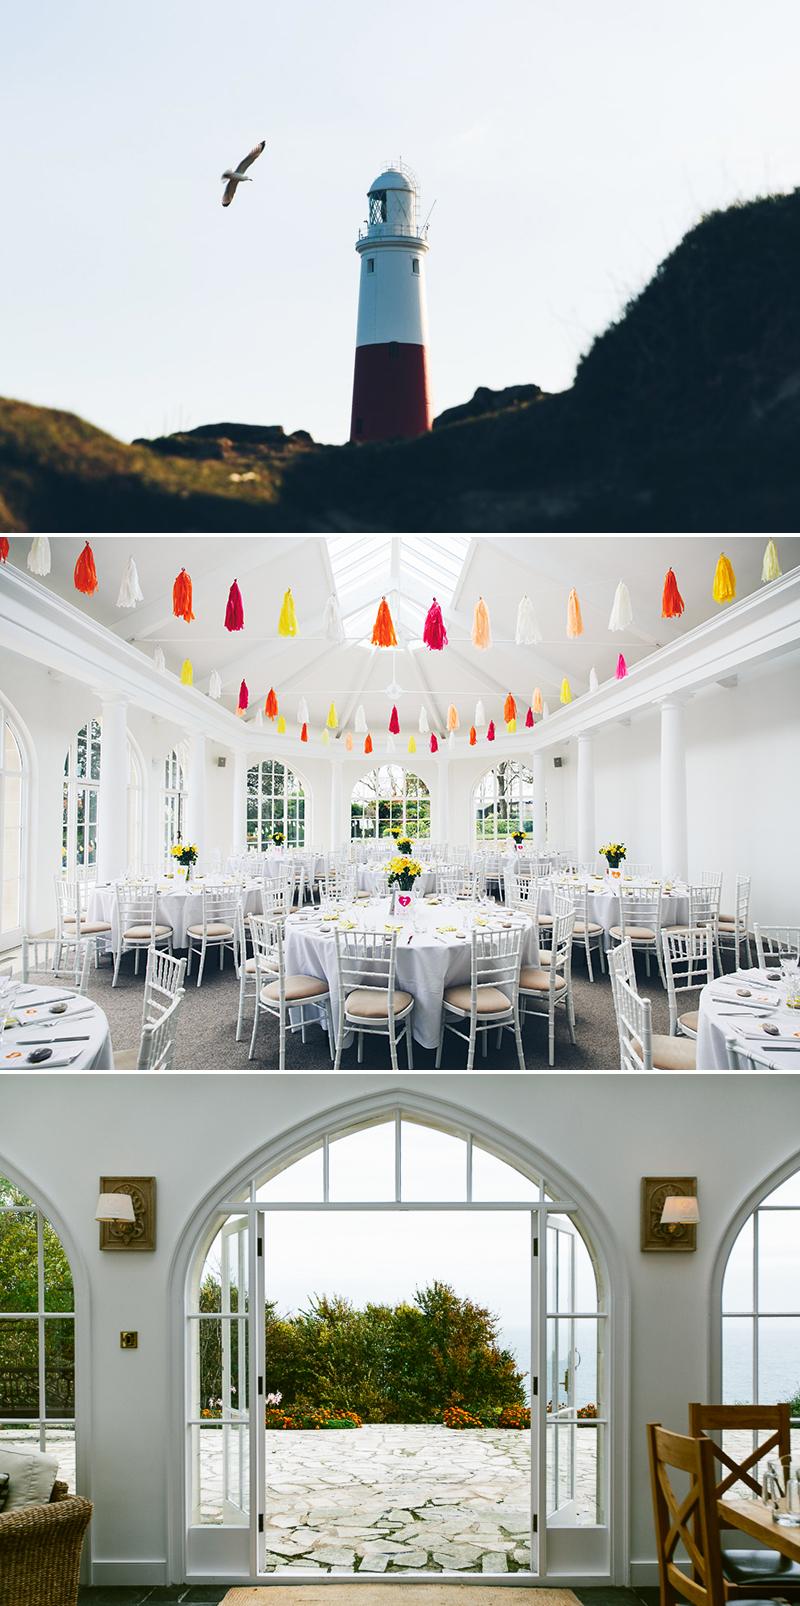 dorset-wedding-venue-20-percent-spring-offer-the-penn-coco-wedding-venues-layer-3